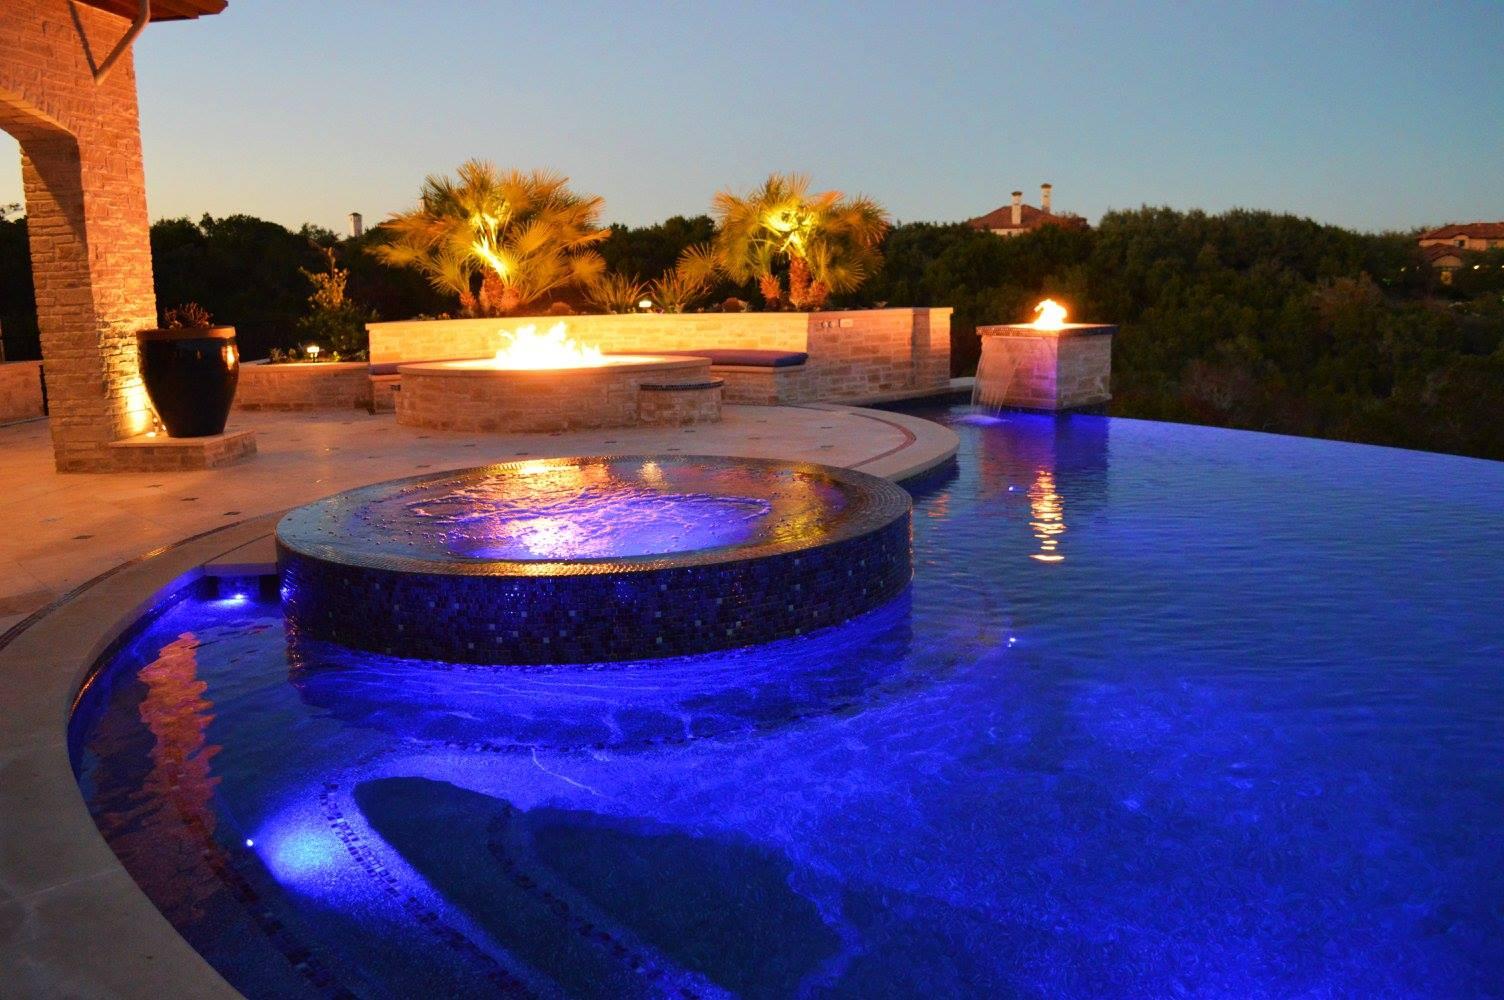 Custom Pool Designs johnson custom pools - pool builder, pool service, swimming pool